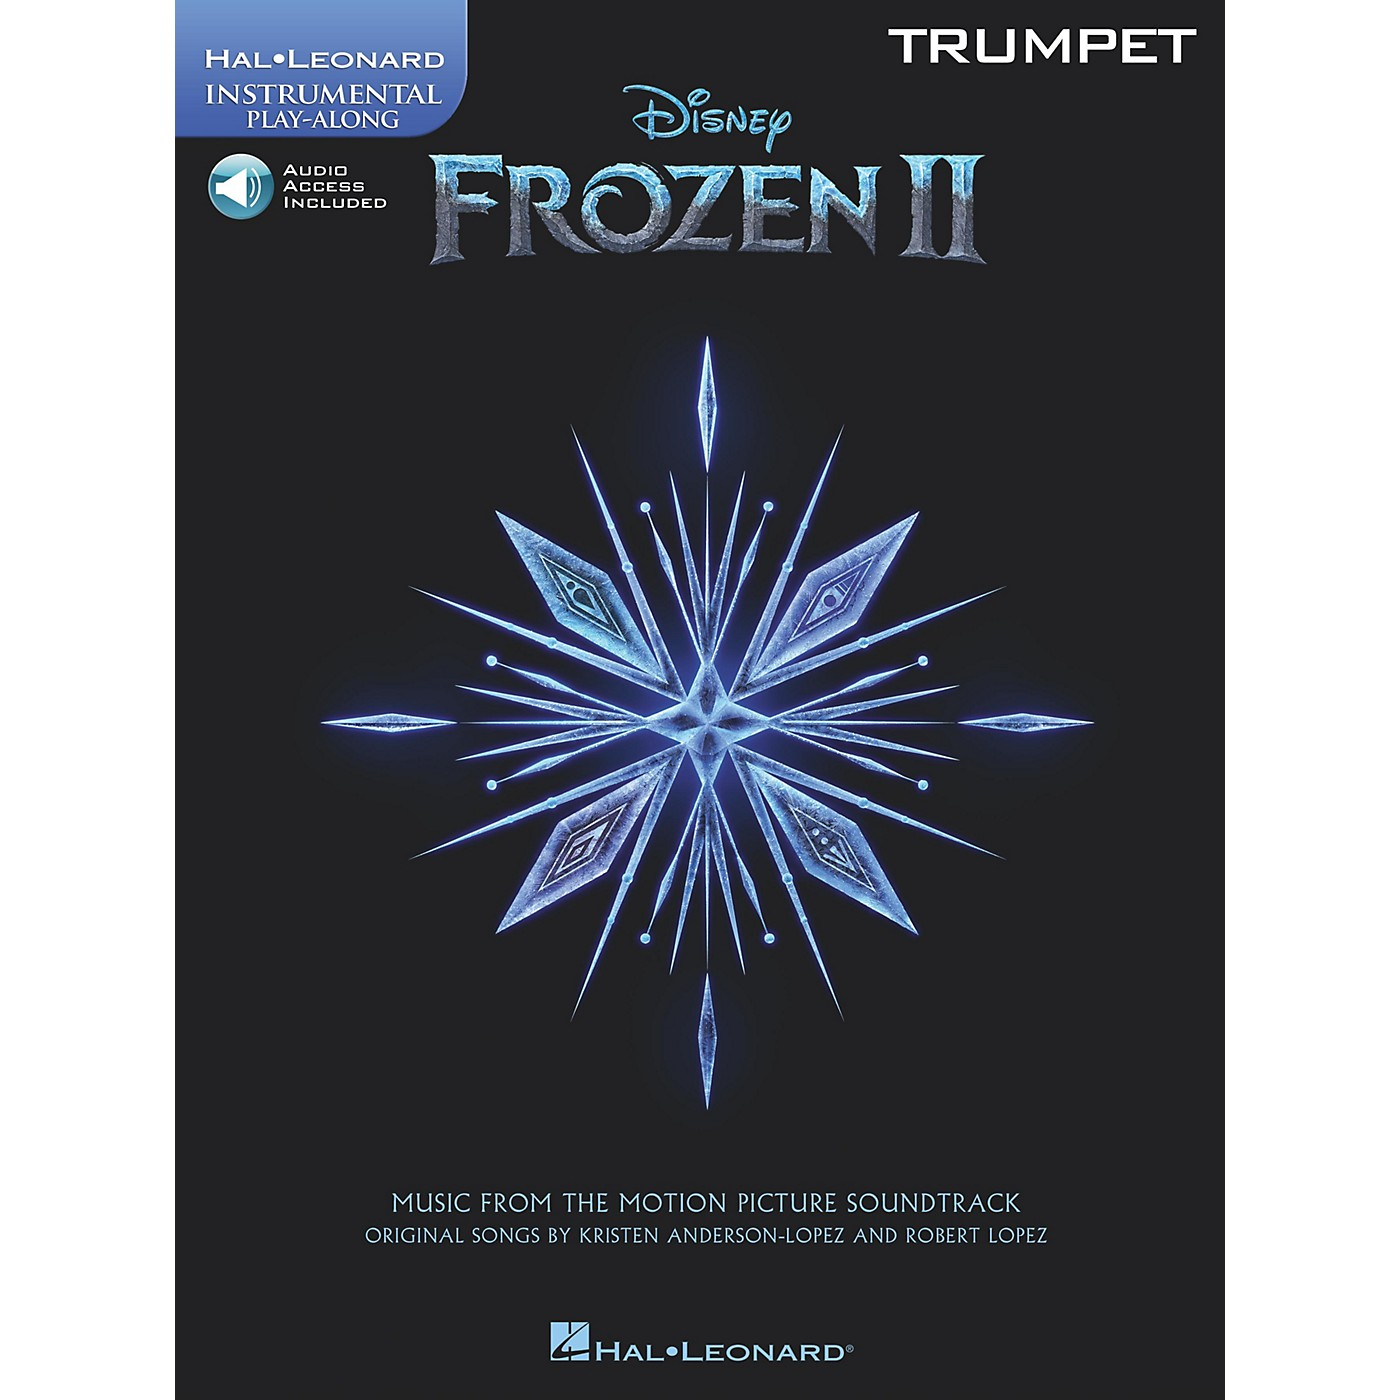 Hal Leonard Frozen II Trumpet Play-Along Instrumental Songbook Book/Audio Online thumbnail